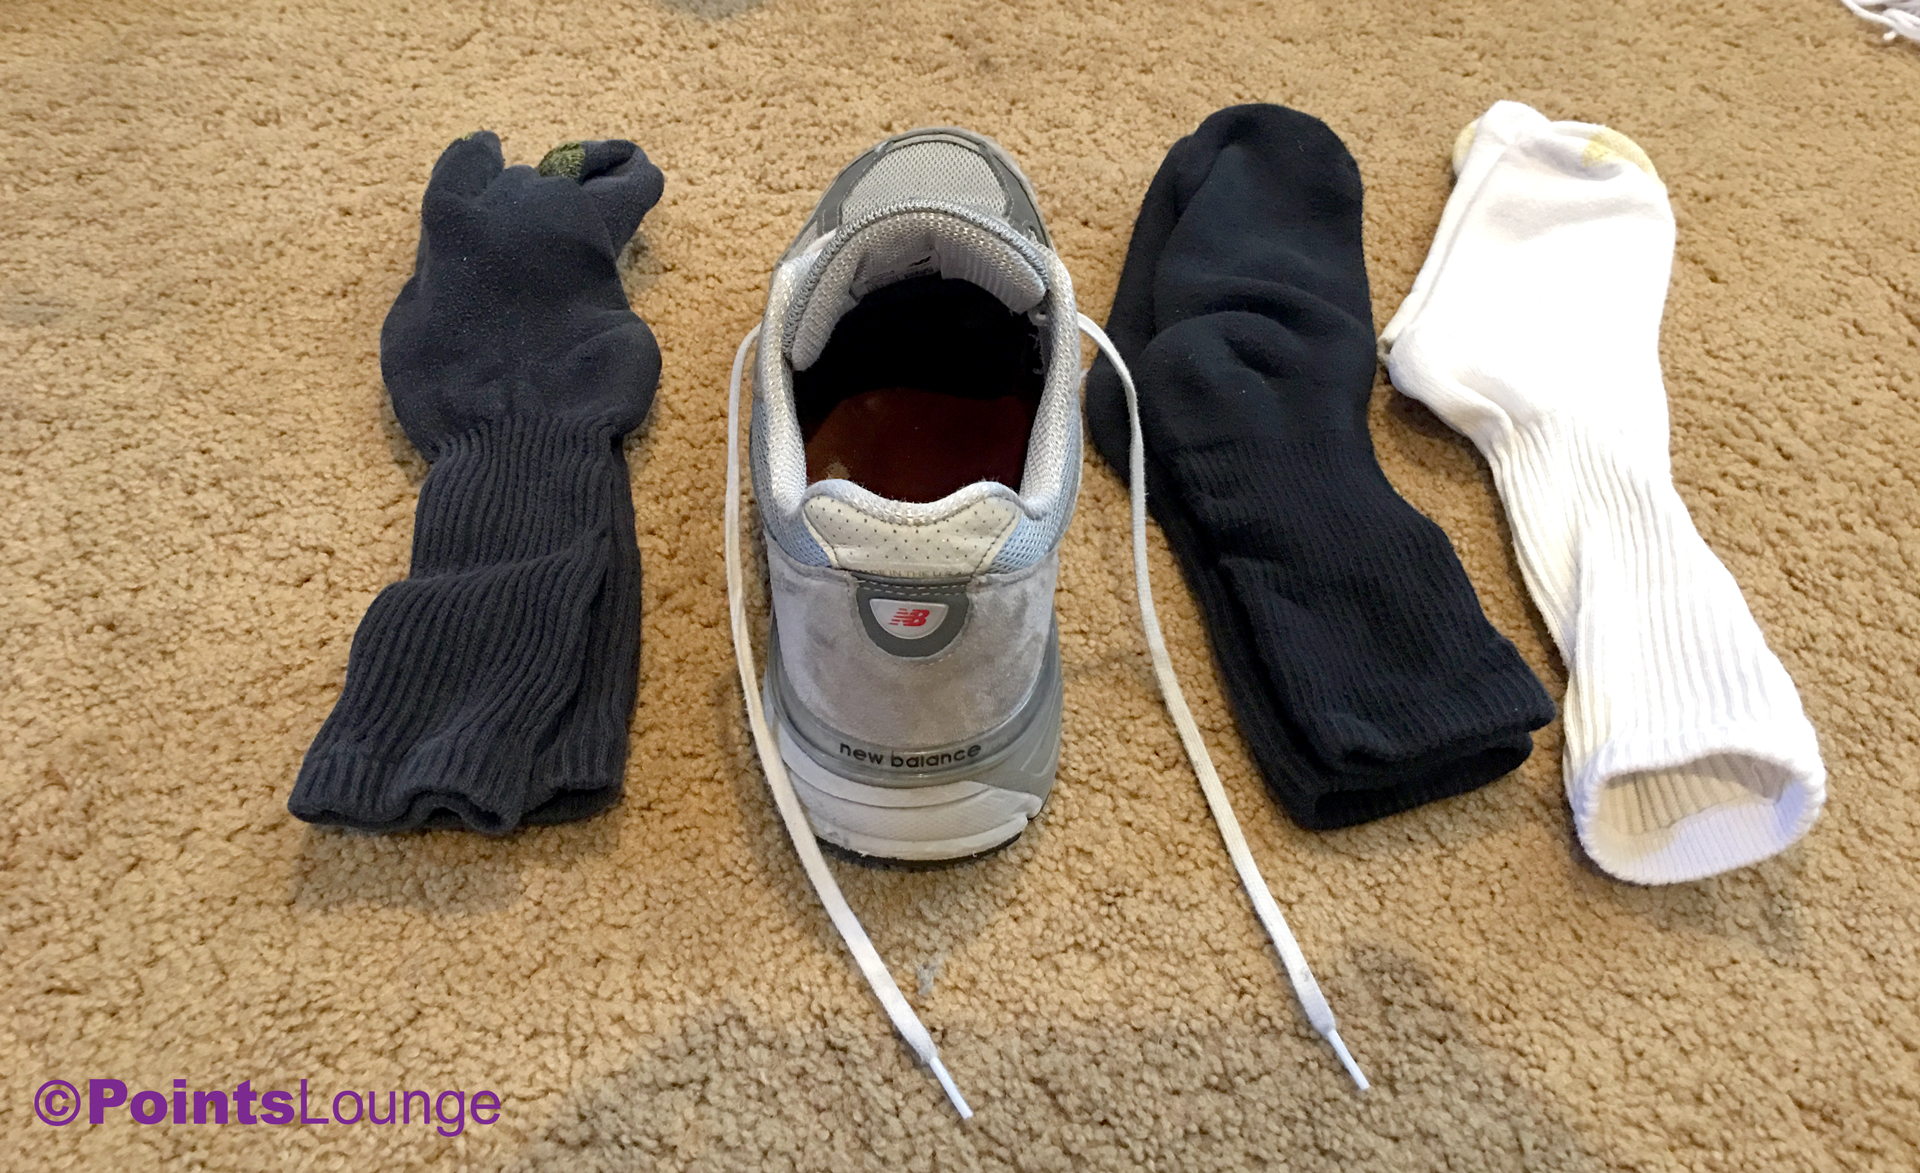 Three pairs of socks and a shoe (New Balance M990GL4)